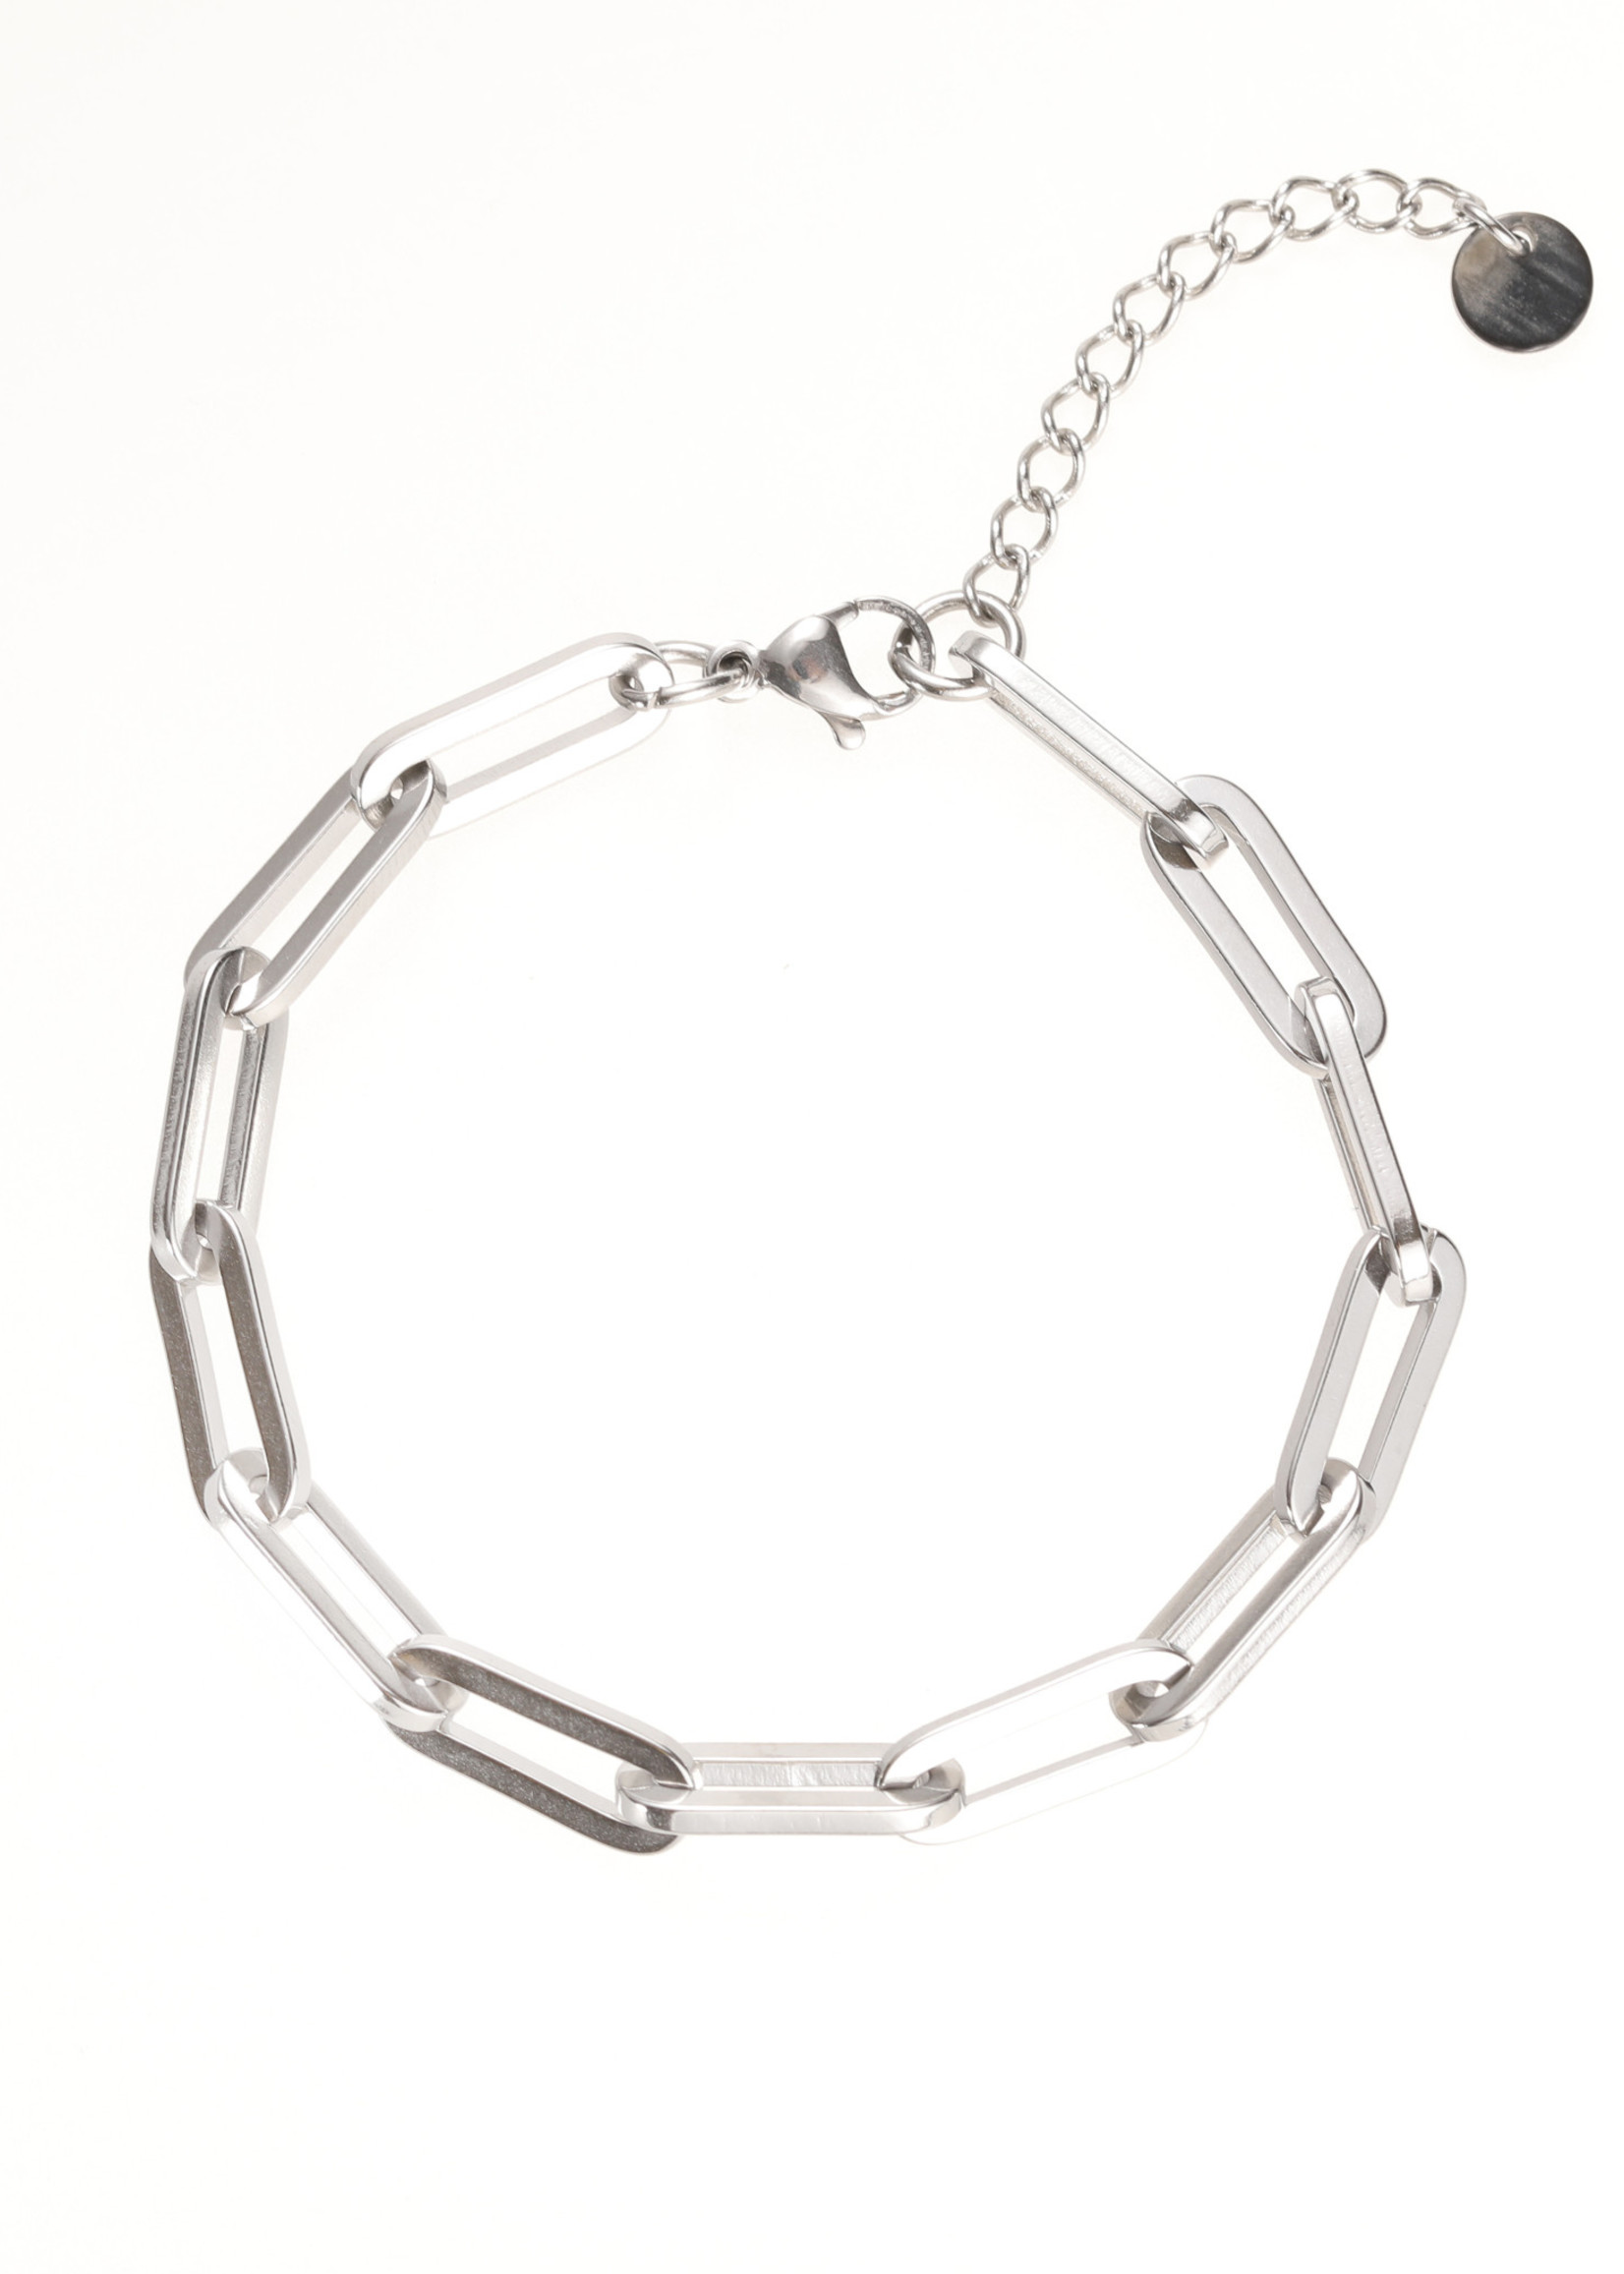 Armband zilver ovale schakel B1861-1